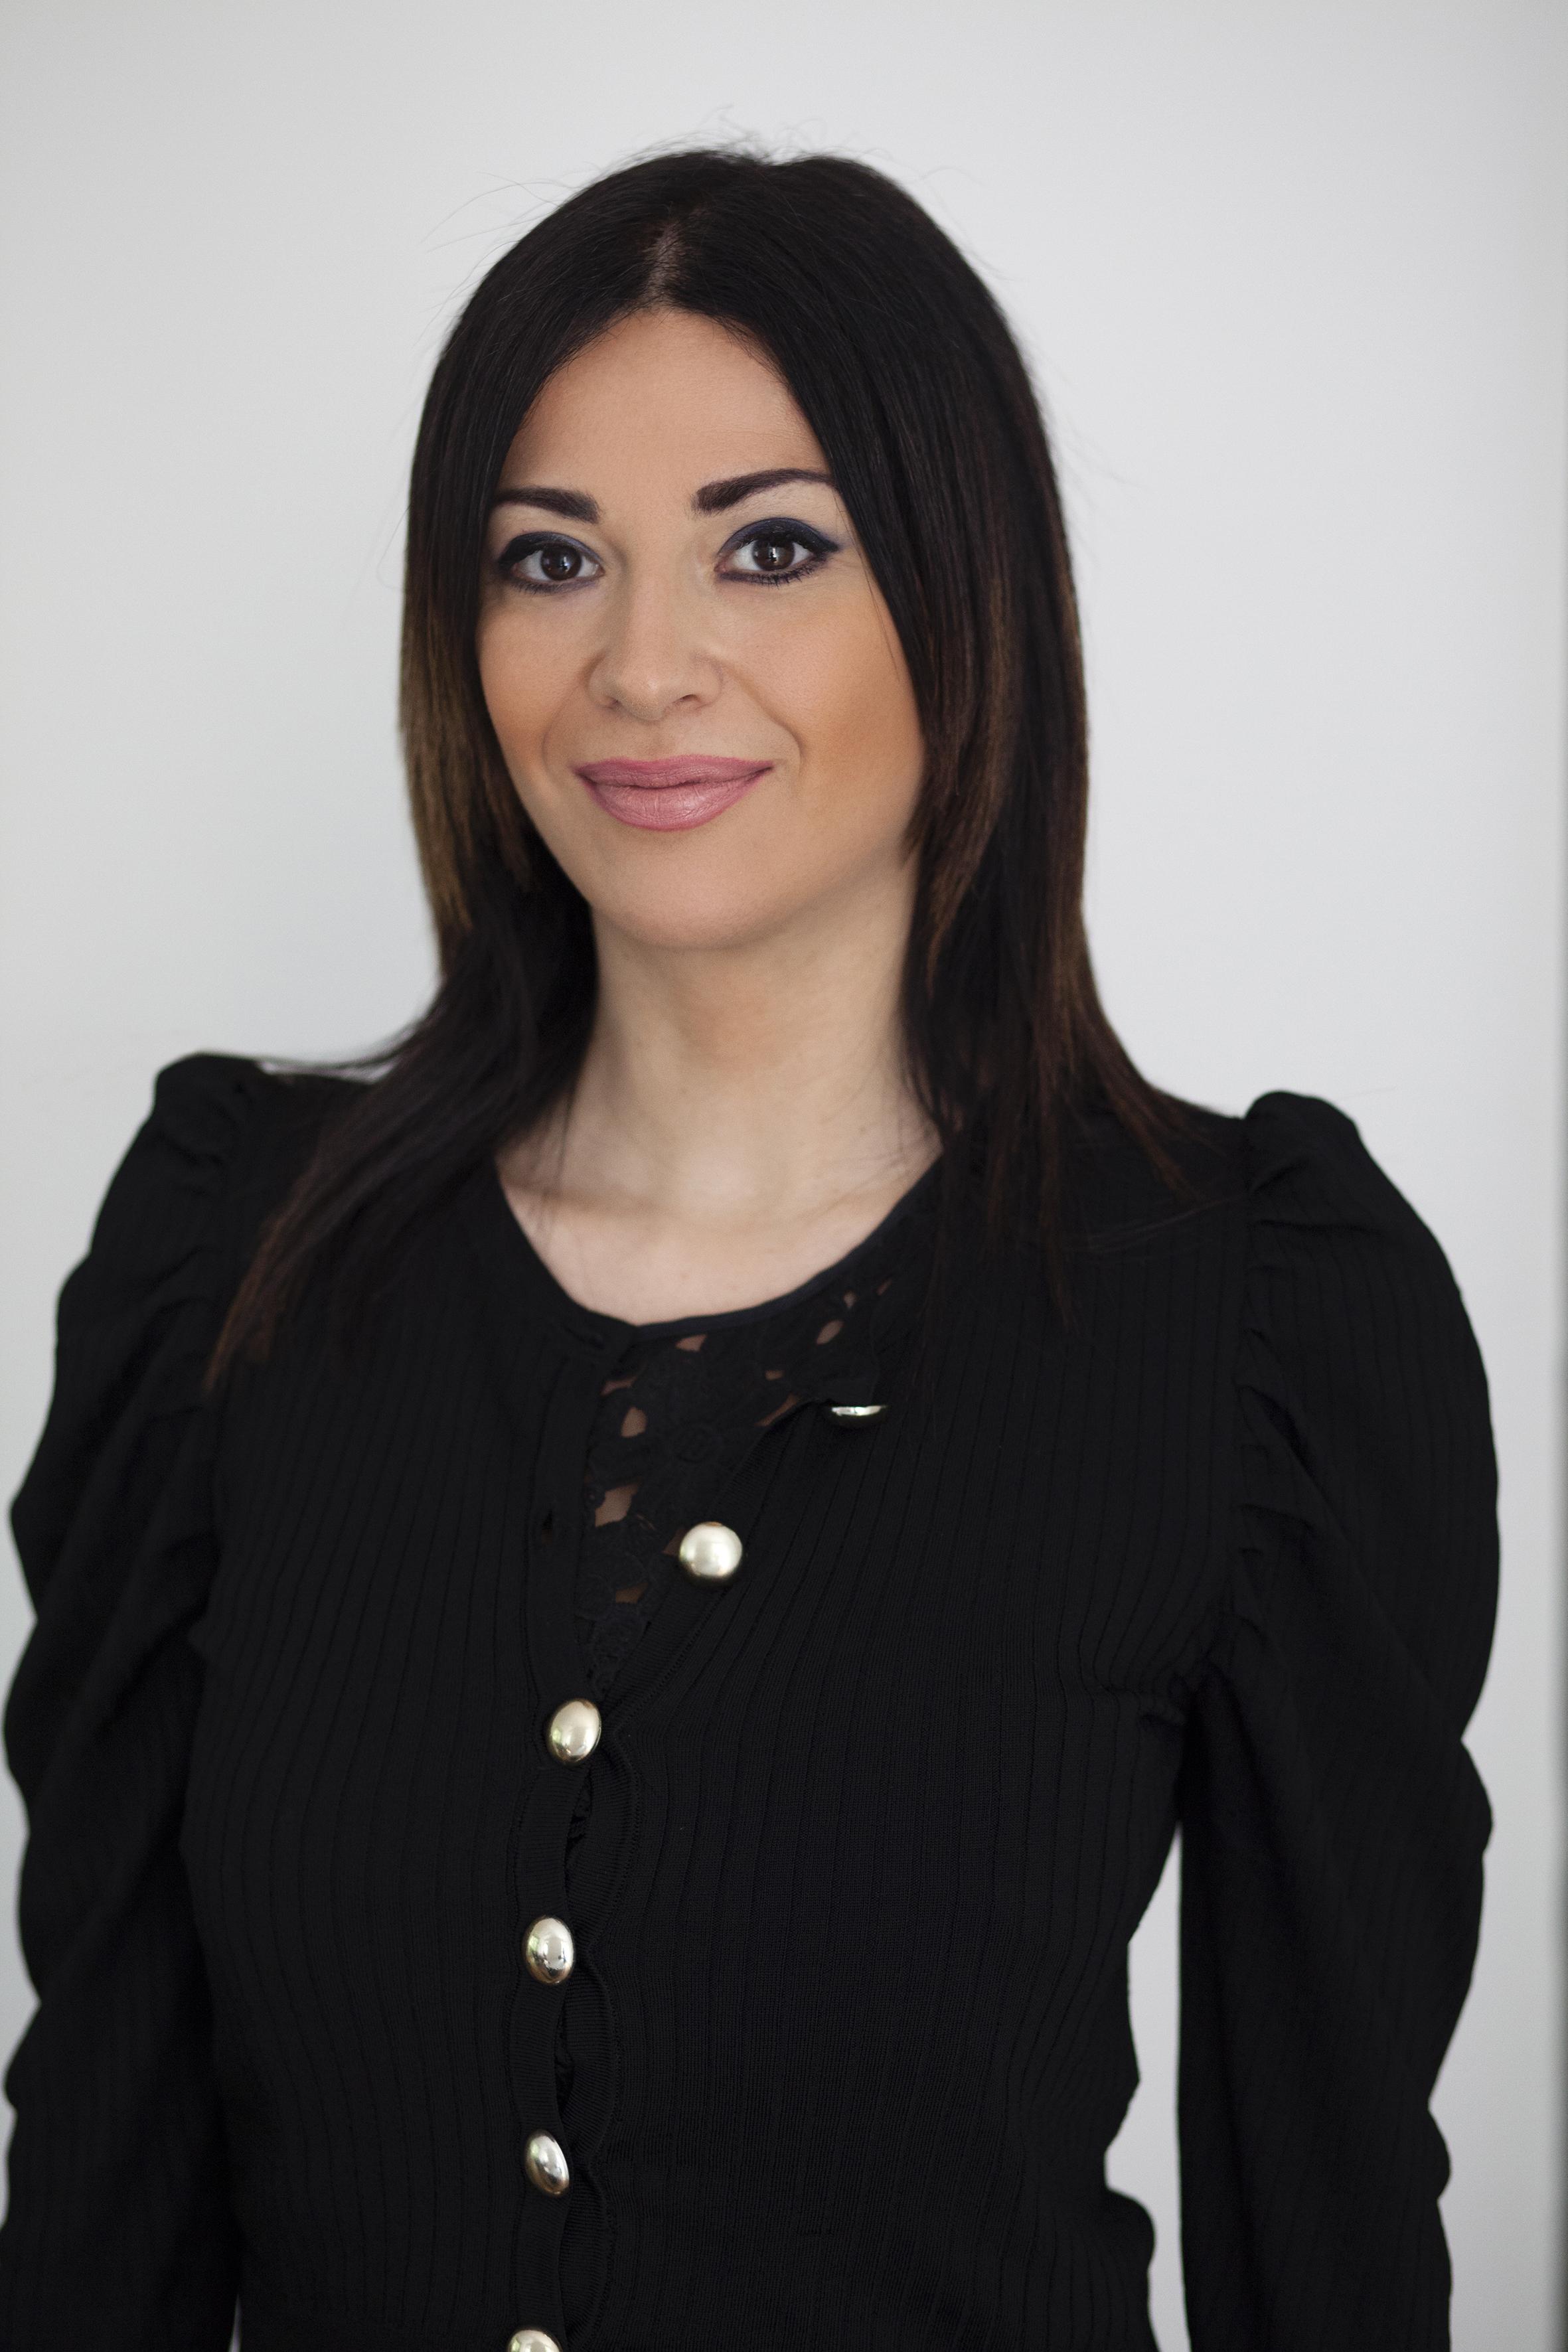 Avv. Stabilito Abg. Maria Teresa Vanacore